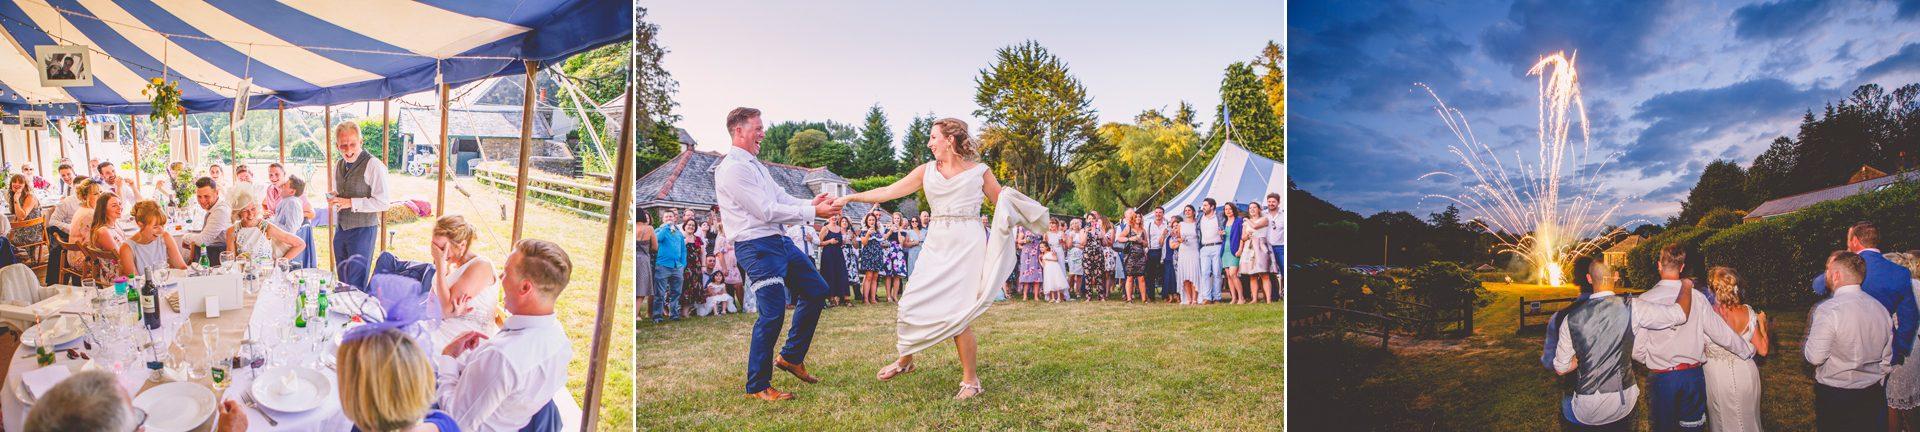 Felicity & Nathan - Tavistock Wedding - Cornwall Wedding Photography